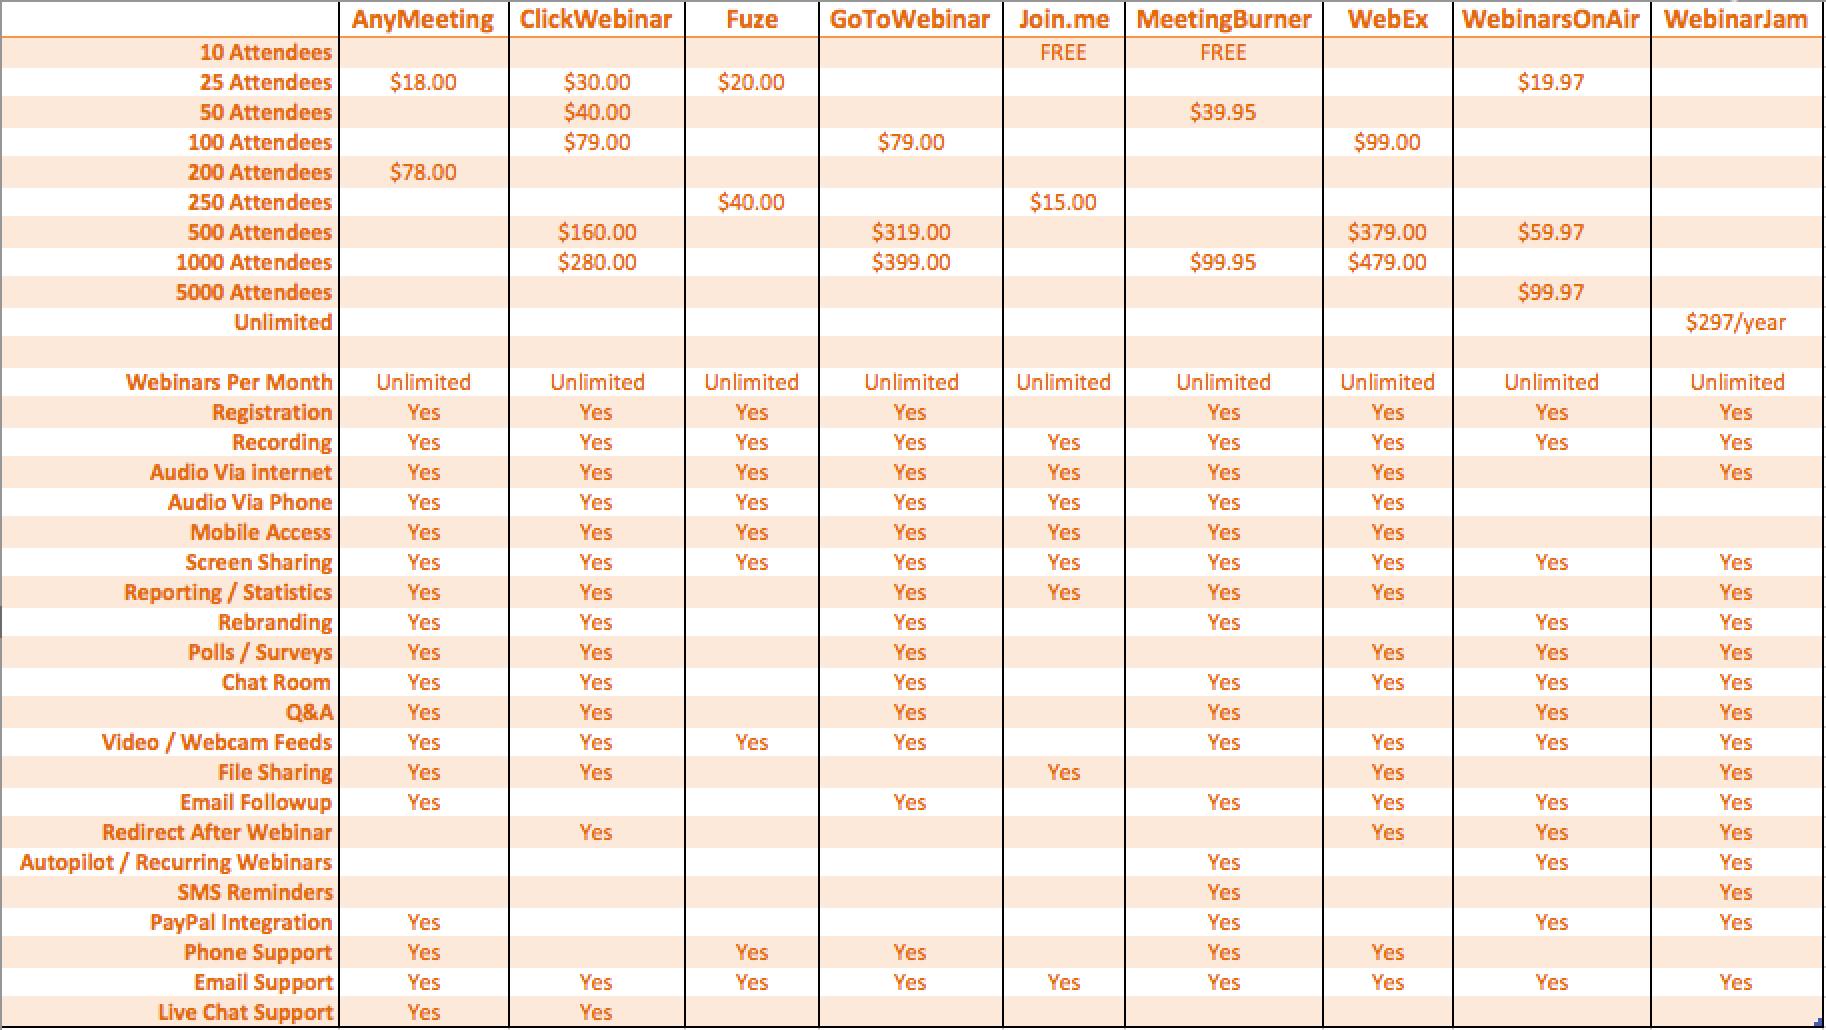 best-webinar-services-software-platforms-comparison